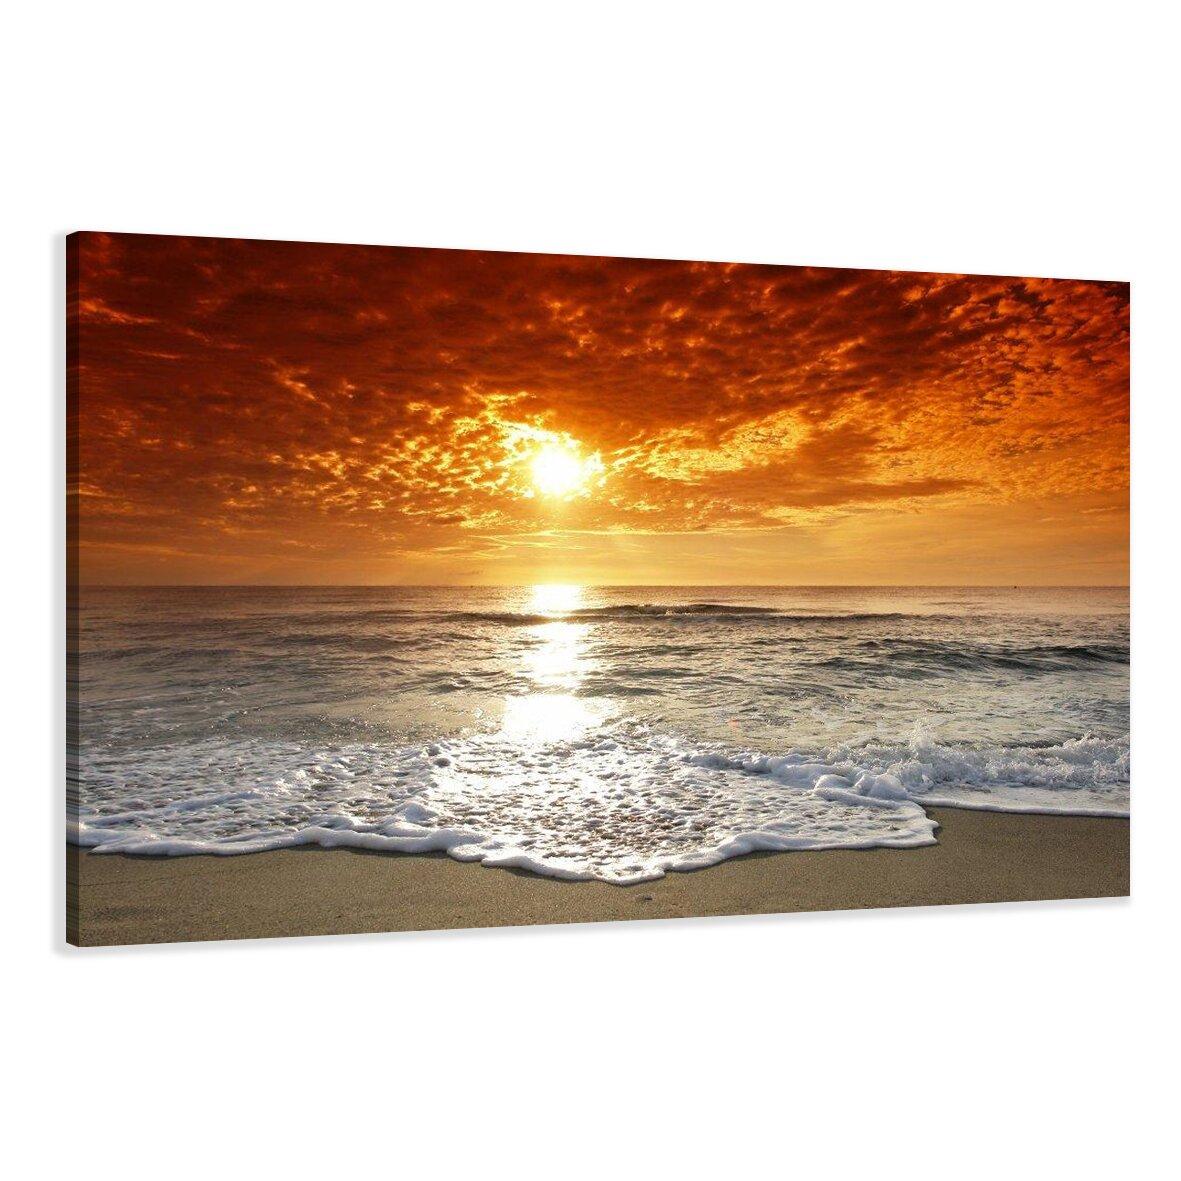 wandbild strand 80 x 120 cm von visario. Black Bedroom Furniture Sets. Home Design Ideas